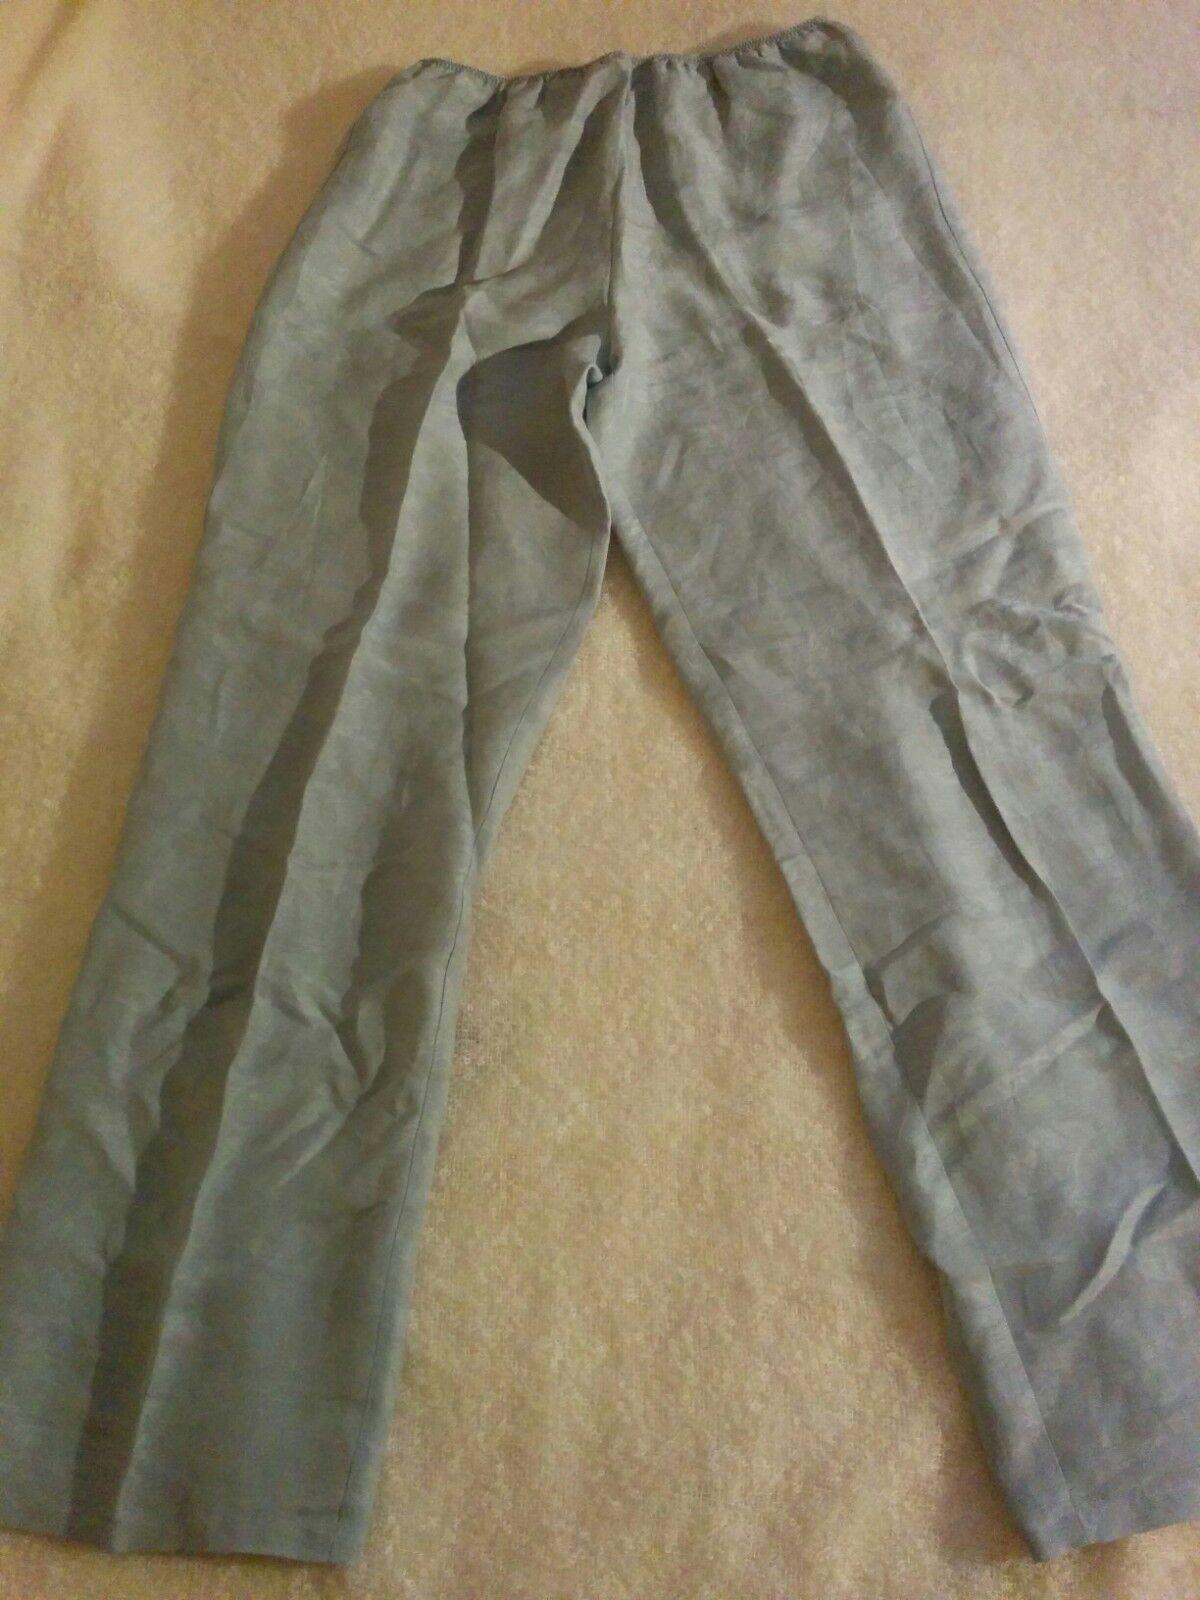 Pantalon Blau clair Armand Ventilo Größe 42